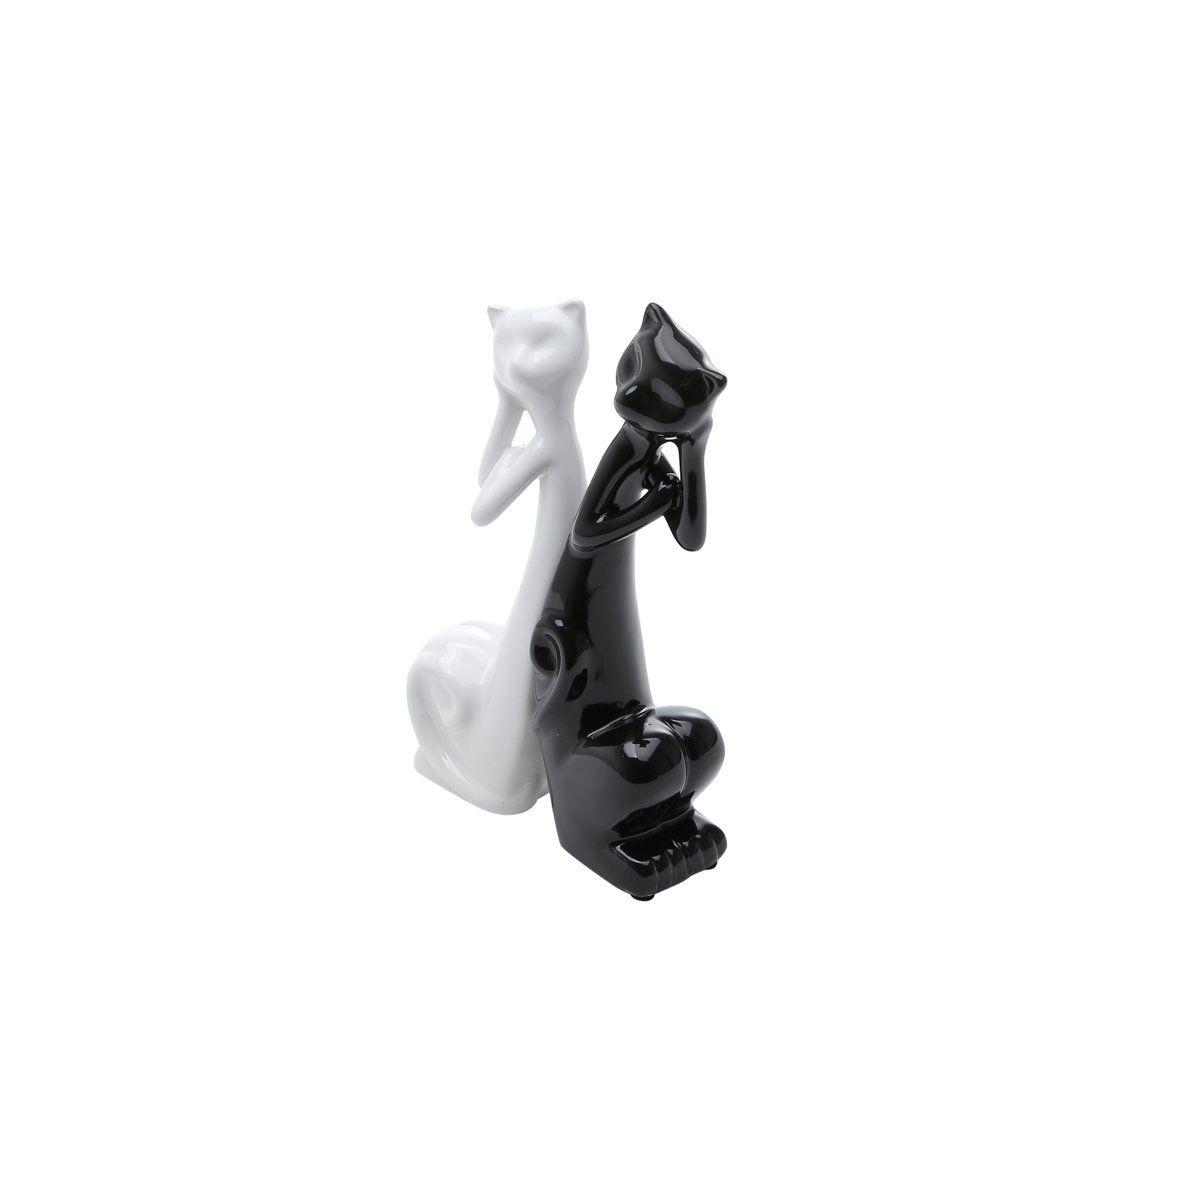 Estatueta 19,5 cm de cerâmica branco e preto Casal Gatos Pensativos Prestige - 2798